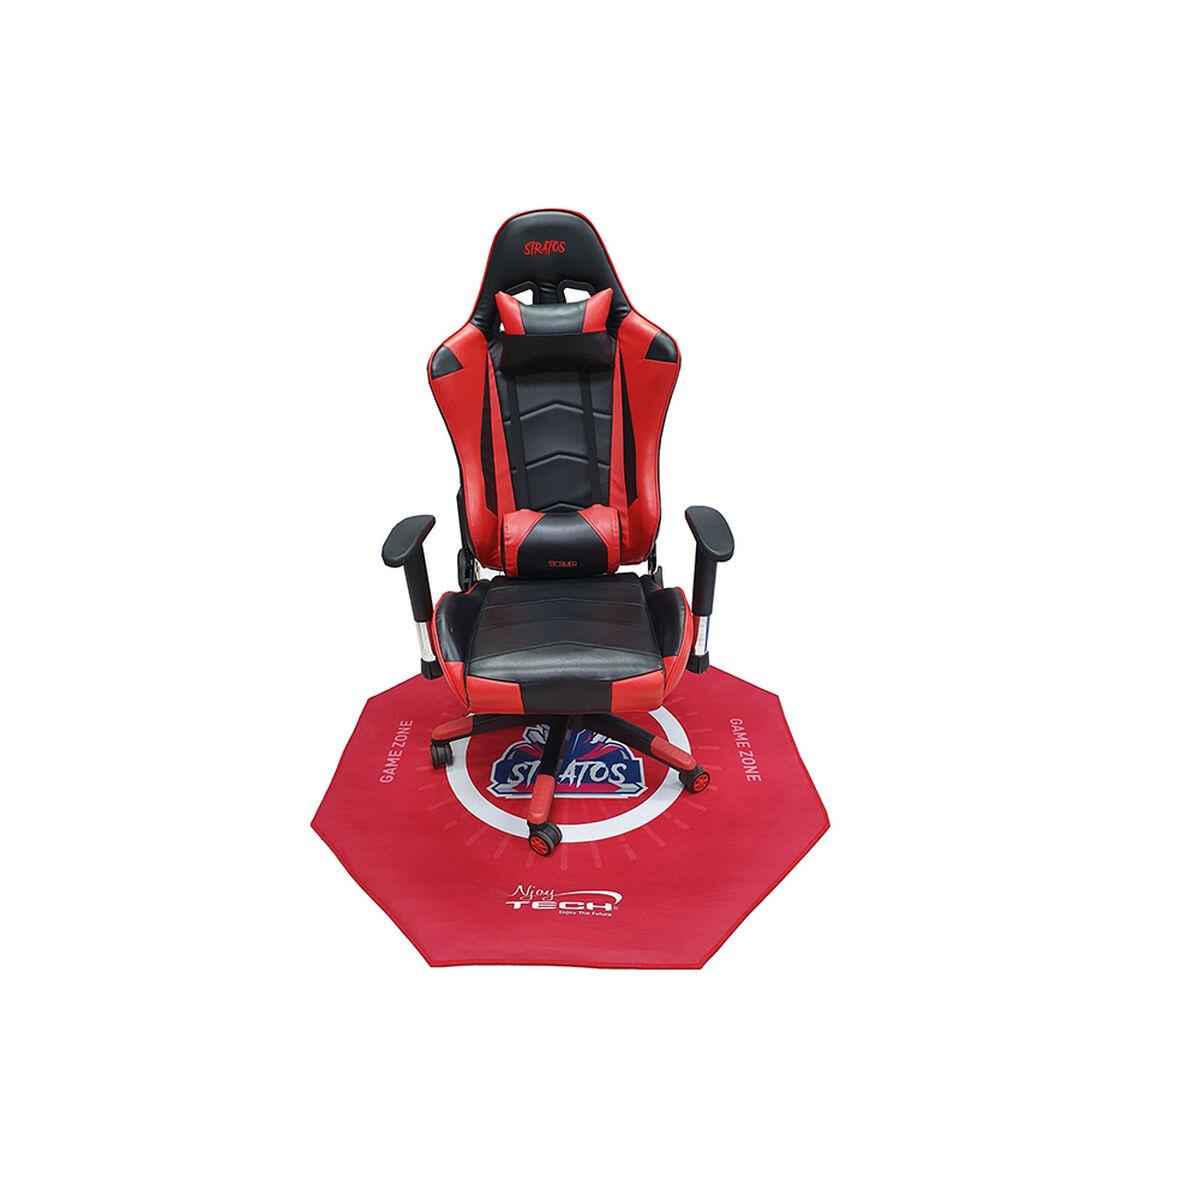 Alfombra Gamer Njoytech NJ-PRORED4 Hexagonal Roja